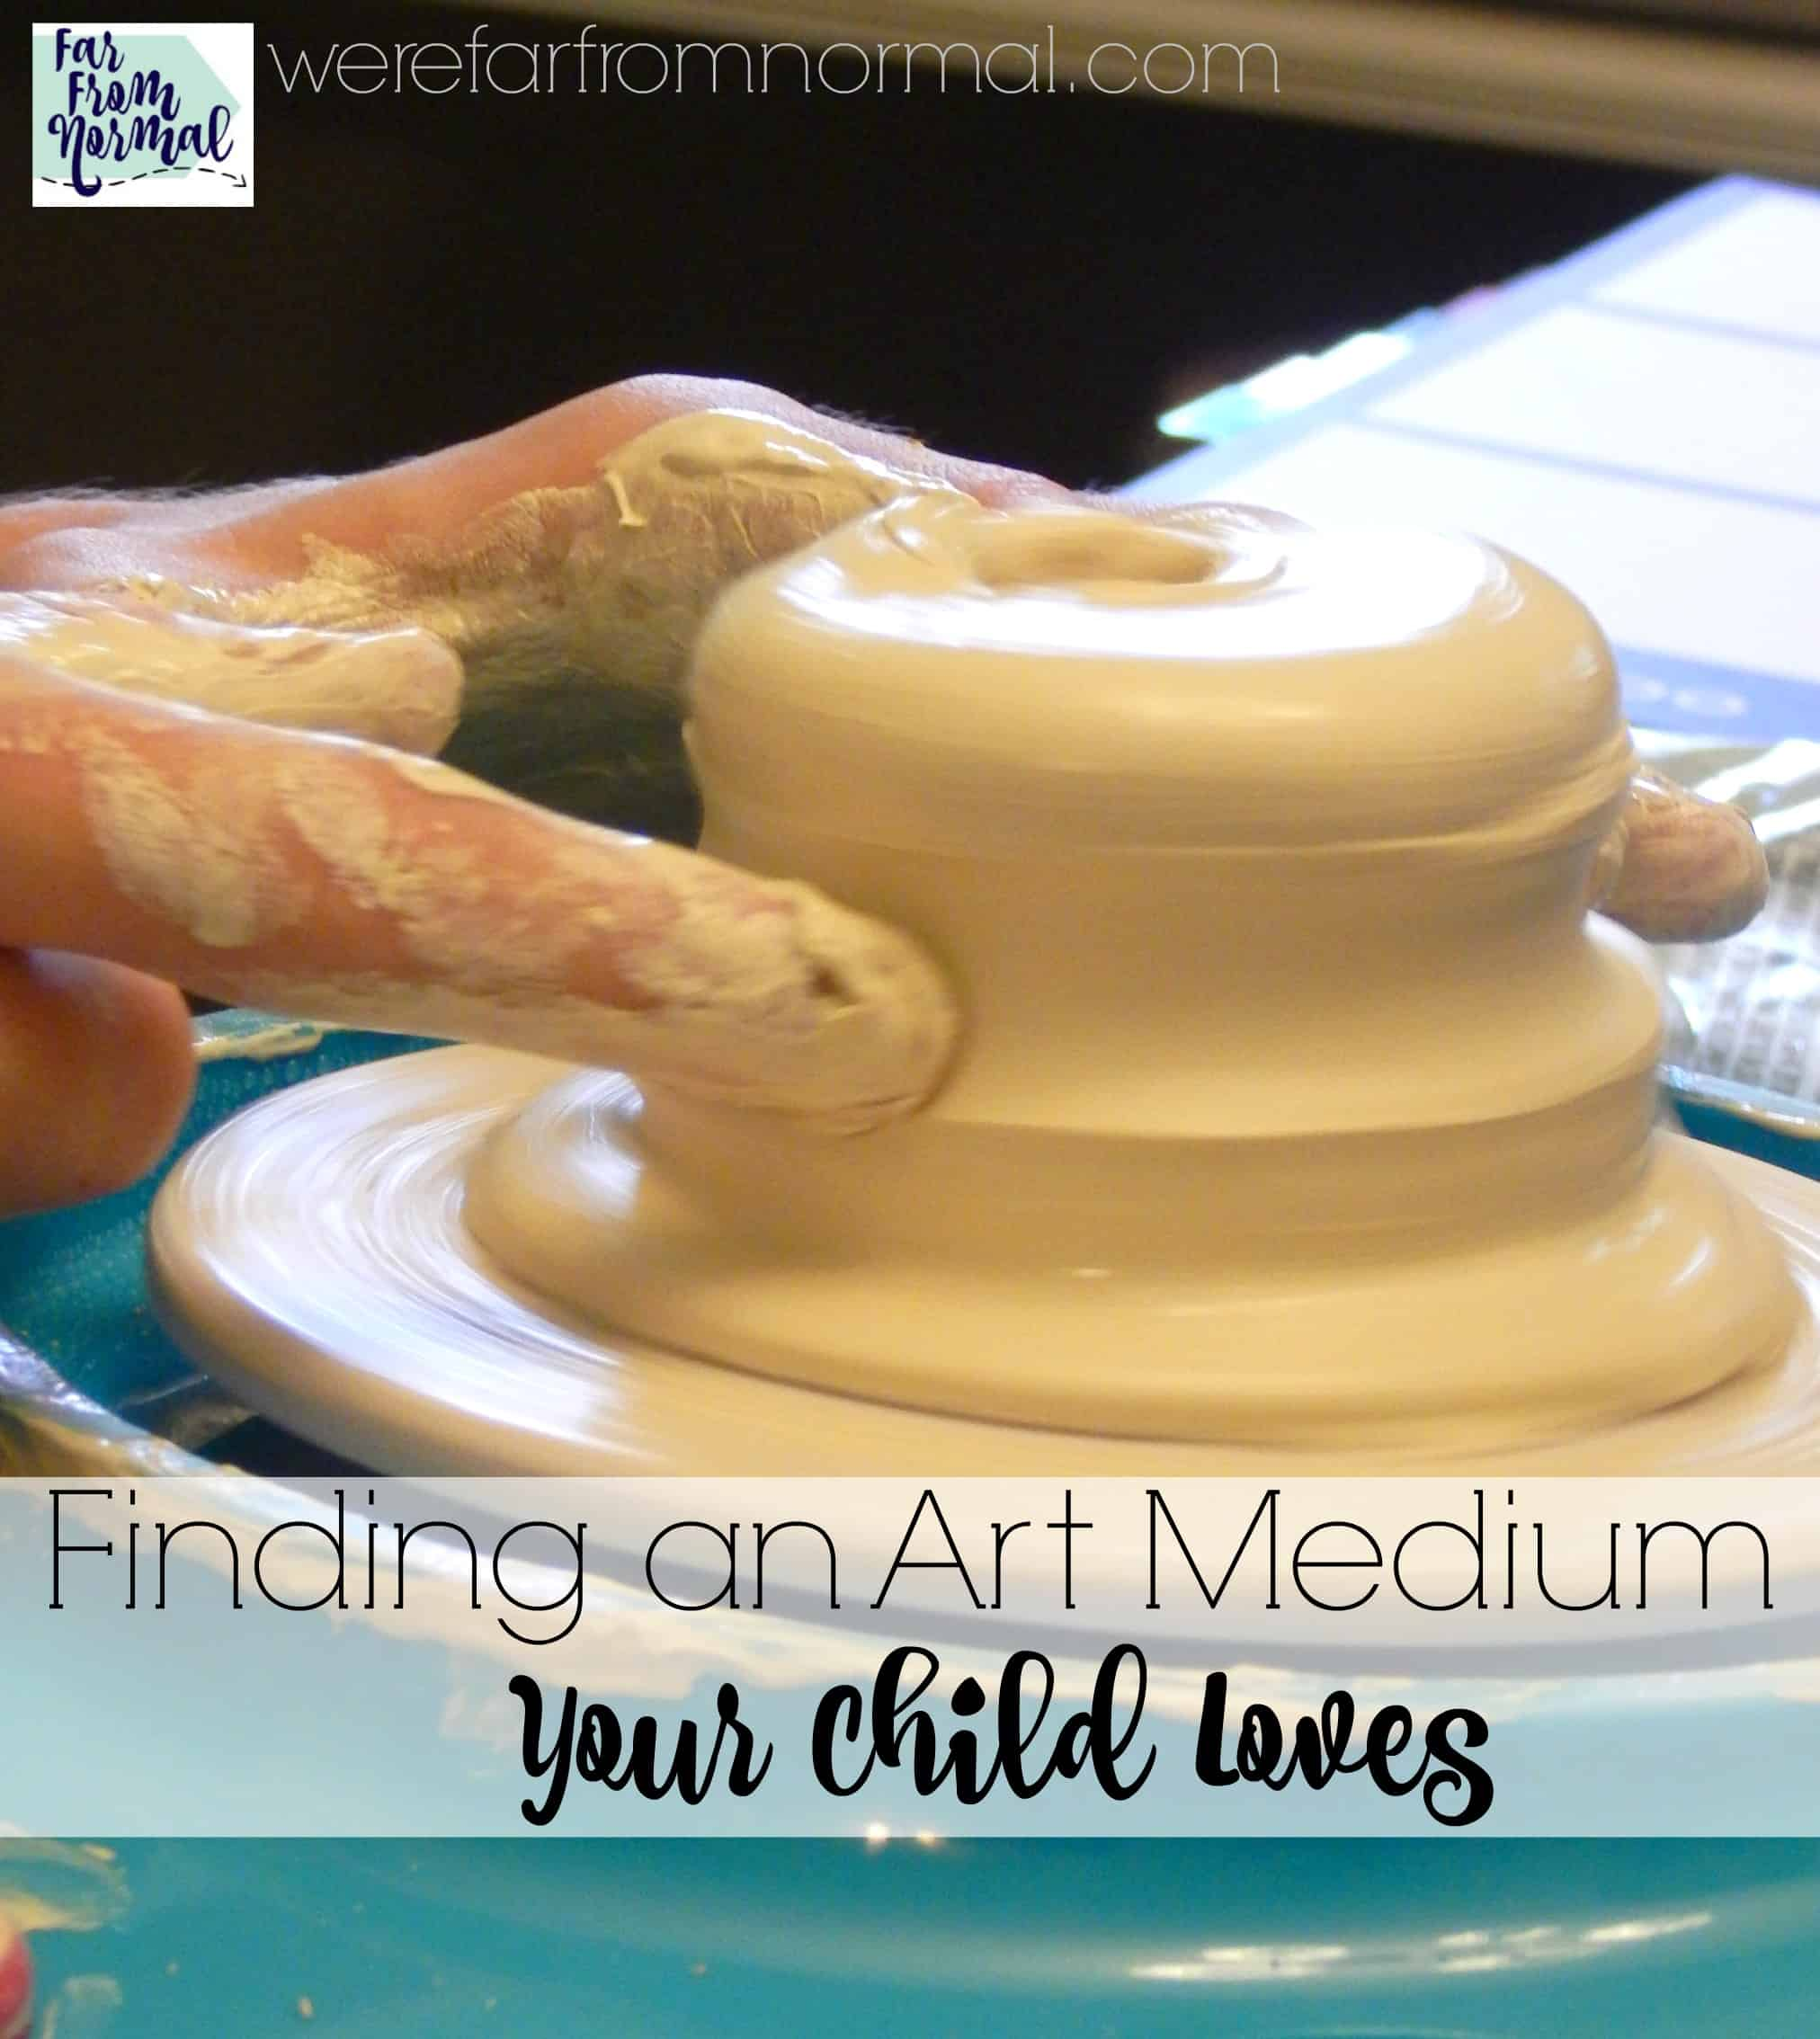 Finding an Art Medium Your Child Loves